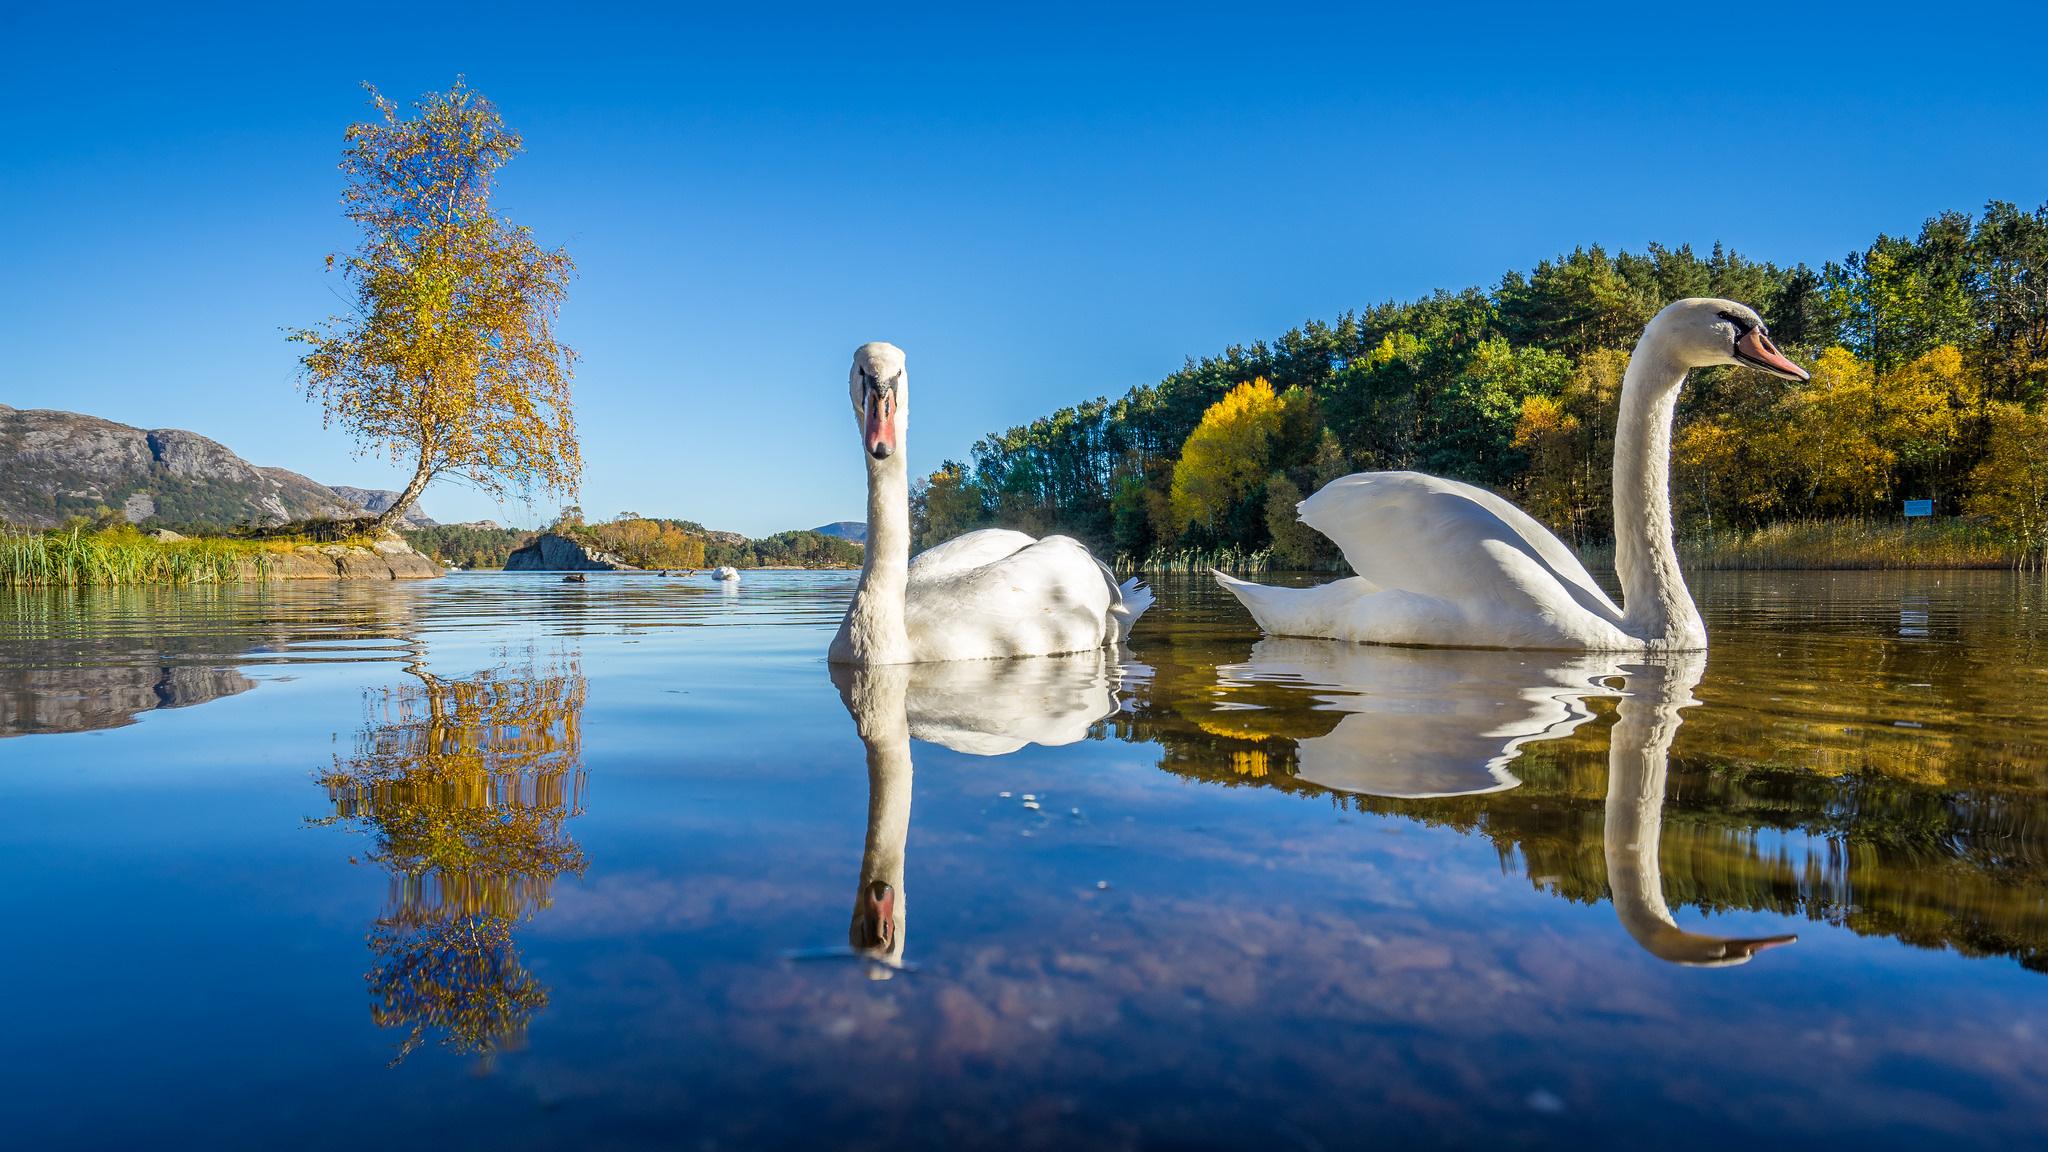 Обои на рабочий стол озеро с лебедями